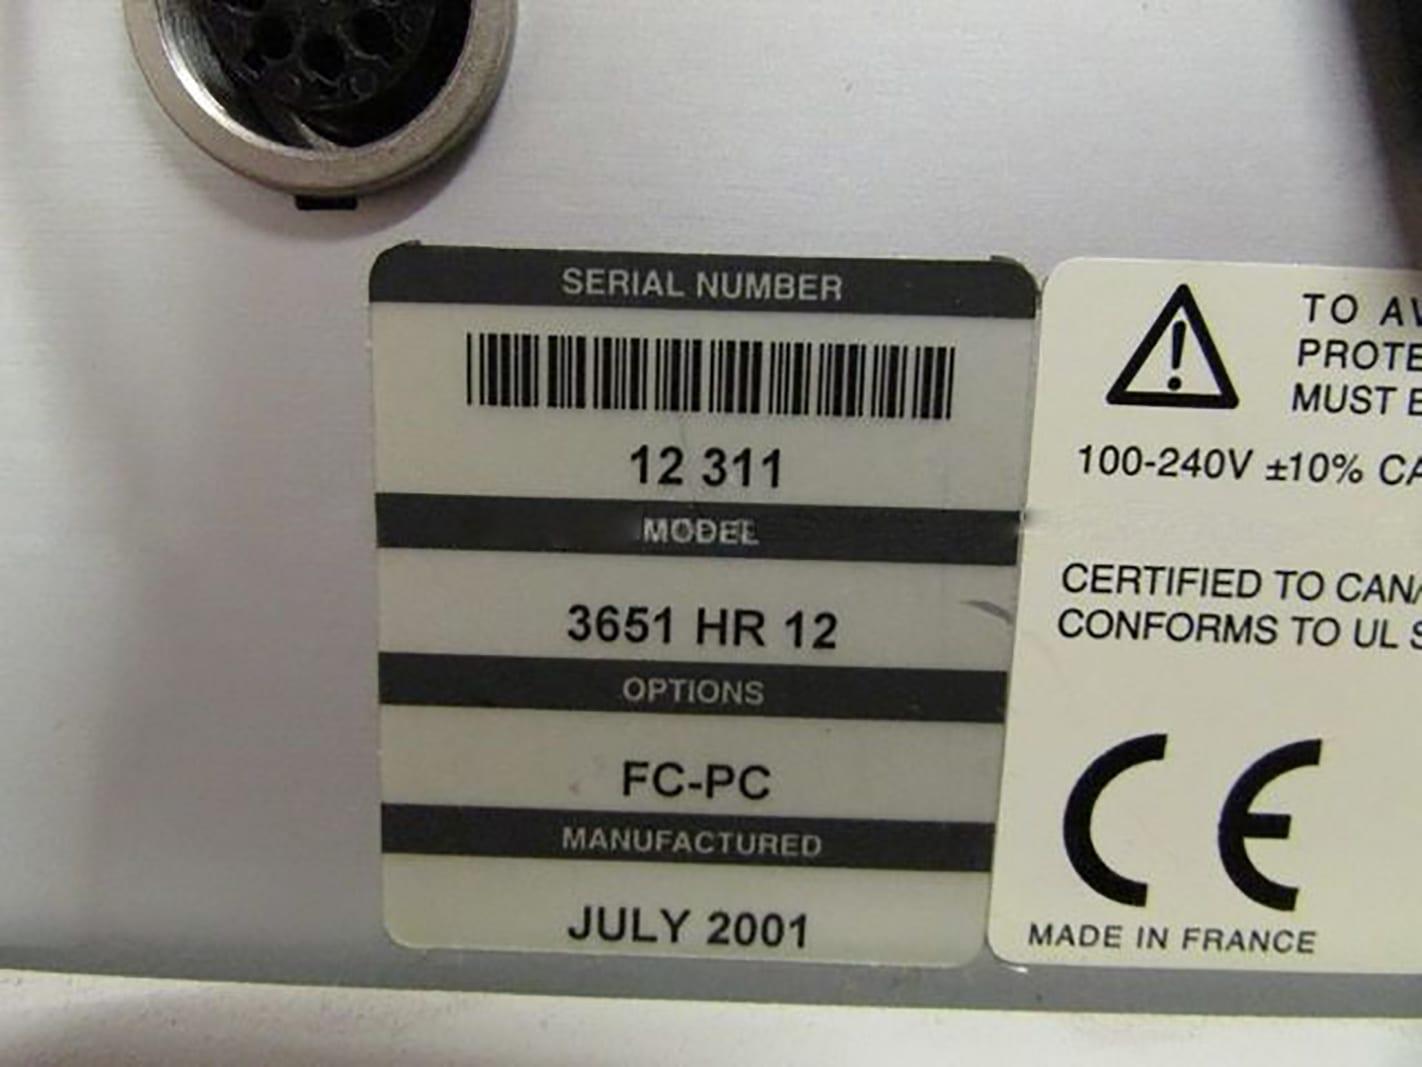 View Photonetics Walics 3651 HR 12 Optical Spectrum Analyzer